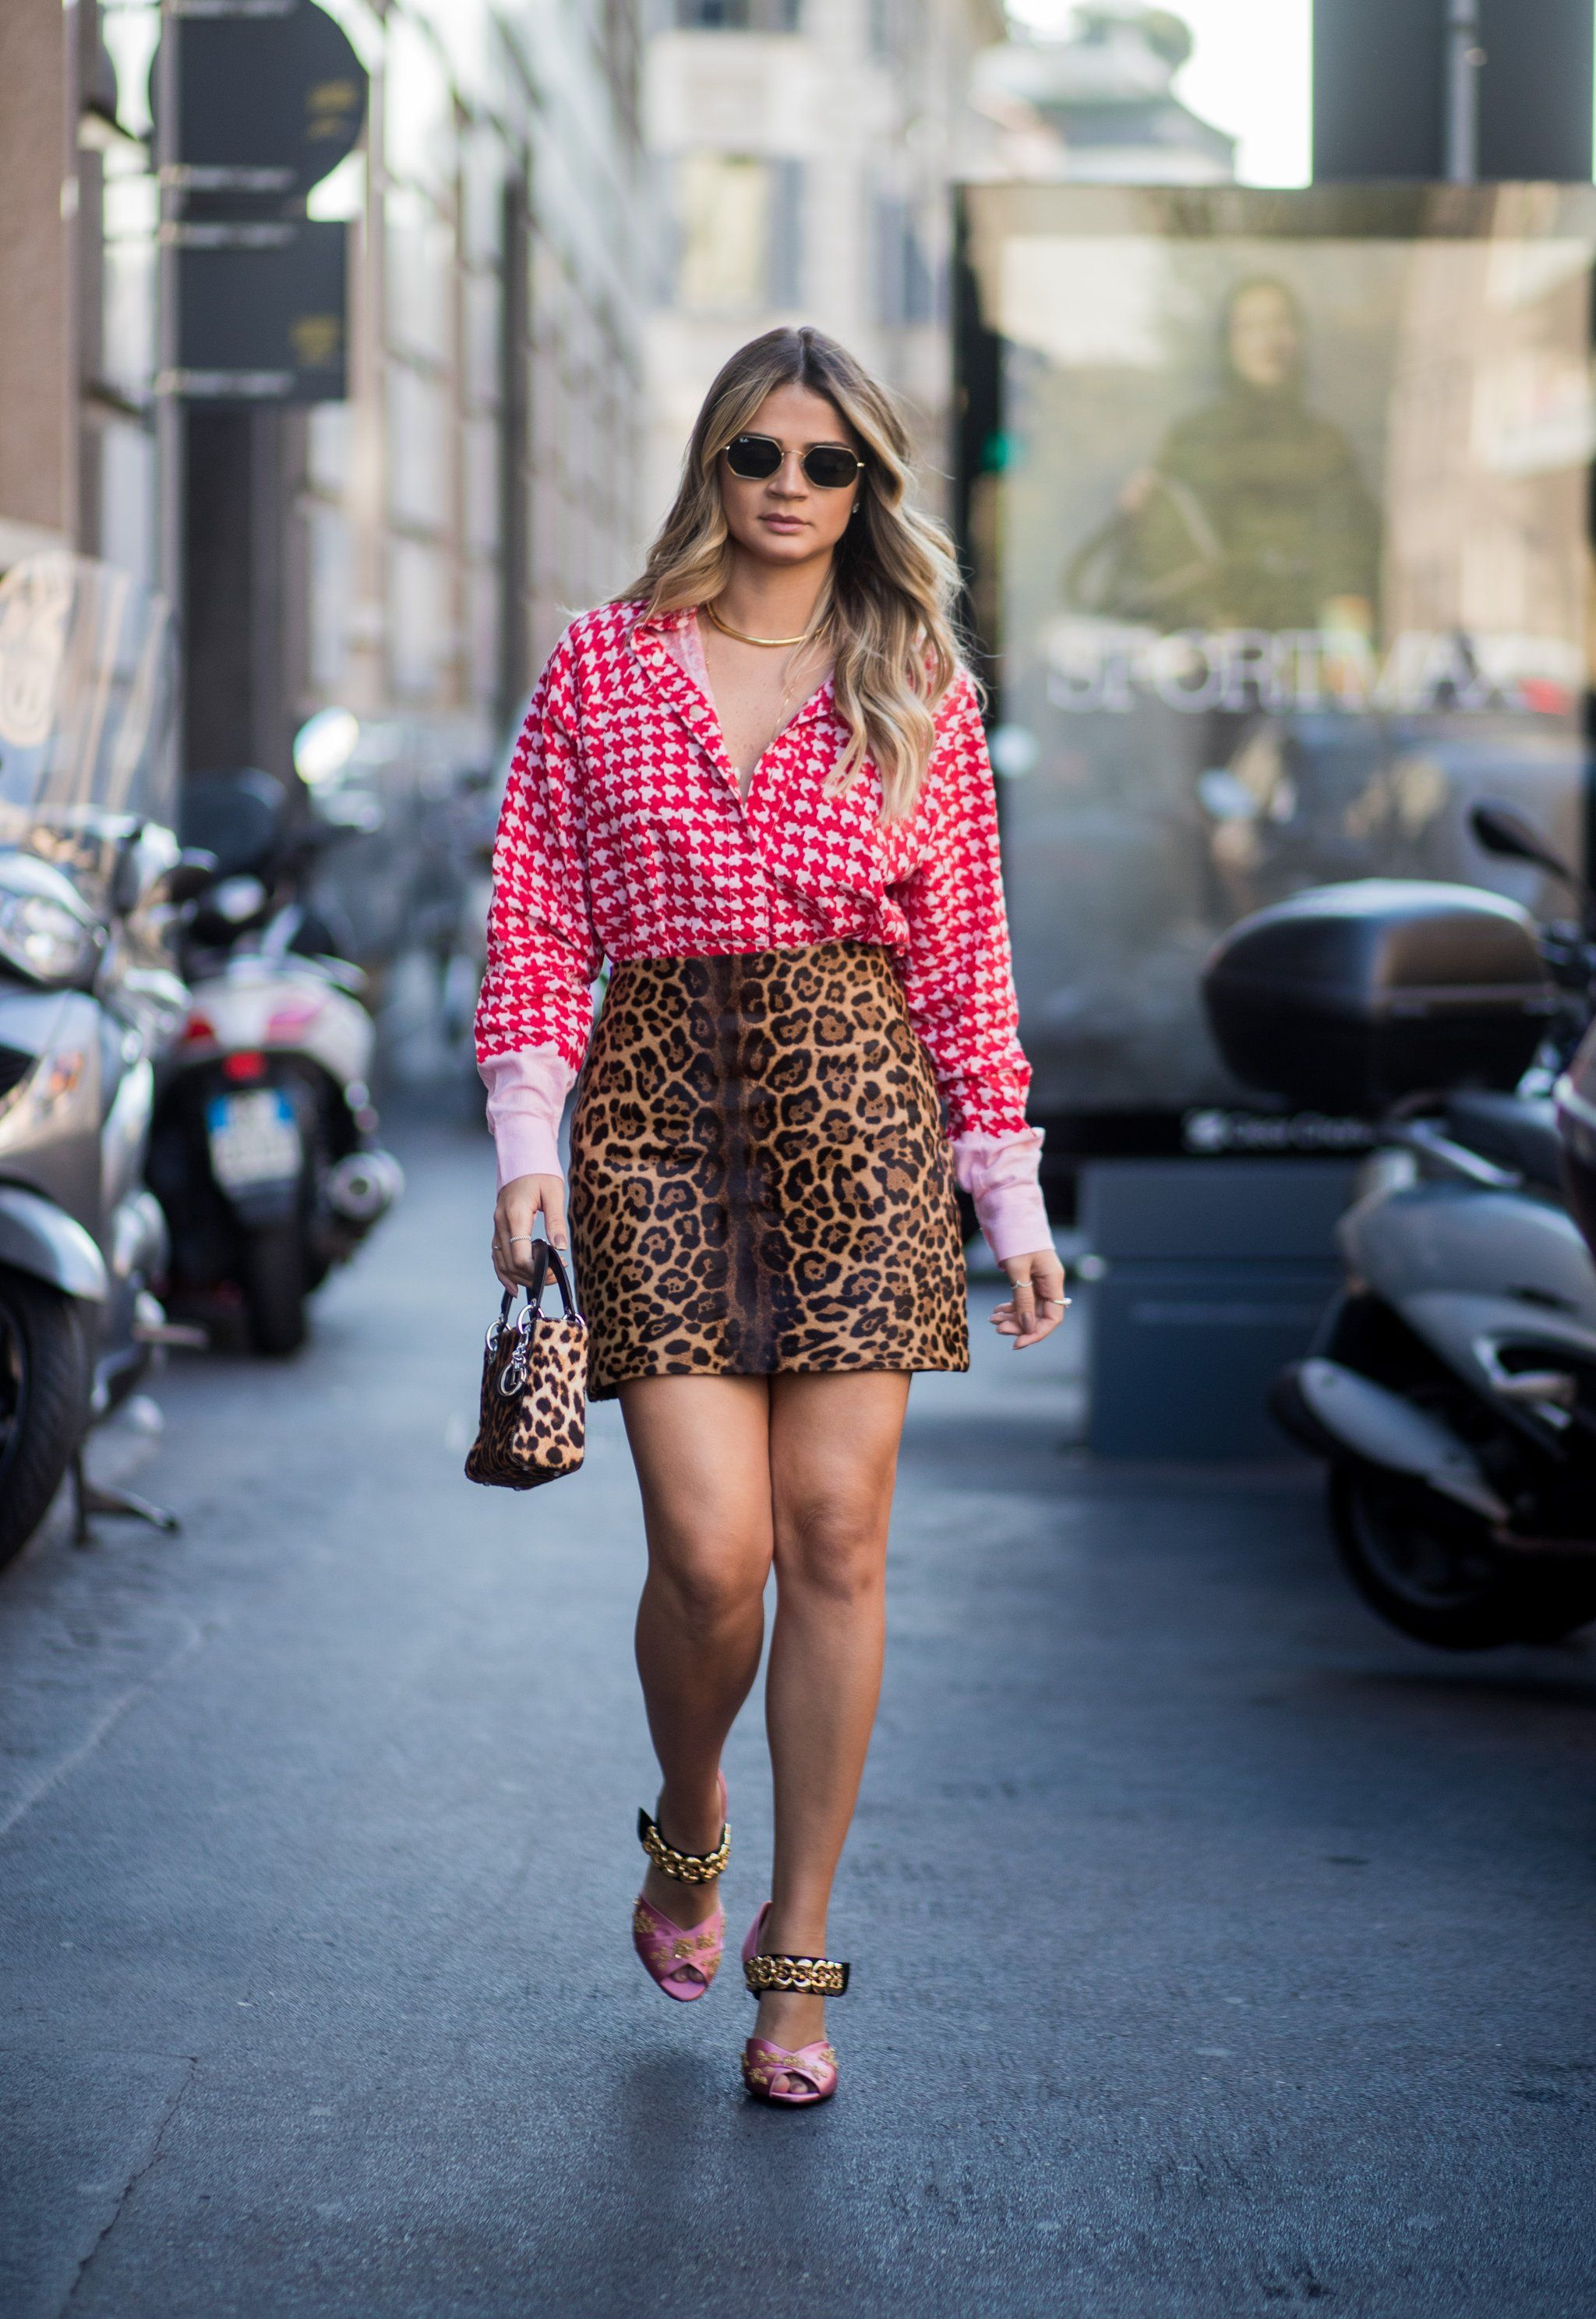 b48c9c6f69 Wear a Checkered Shirt With a Leopard-Print Skirt